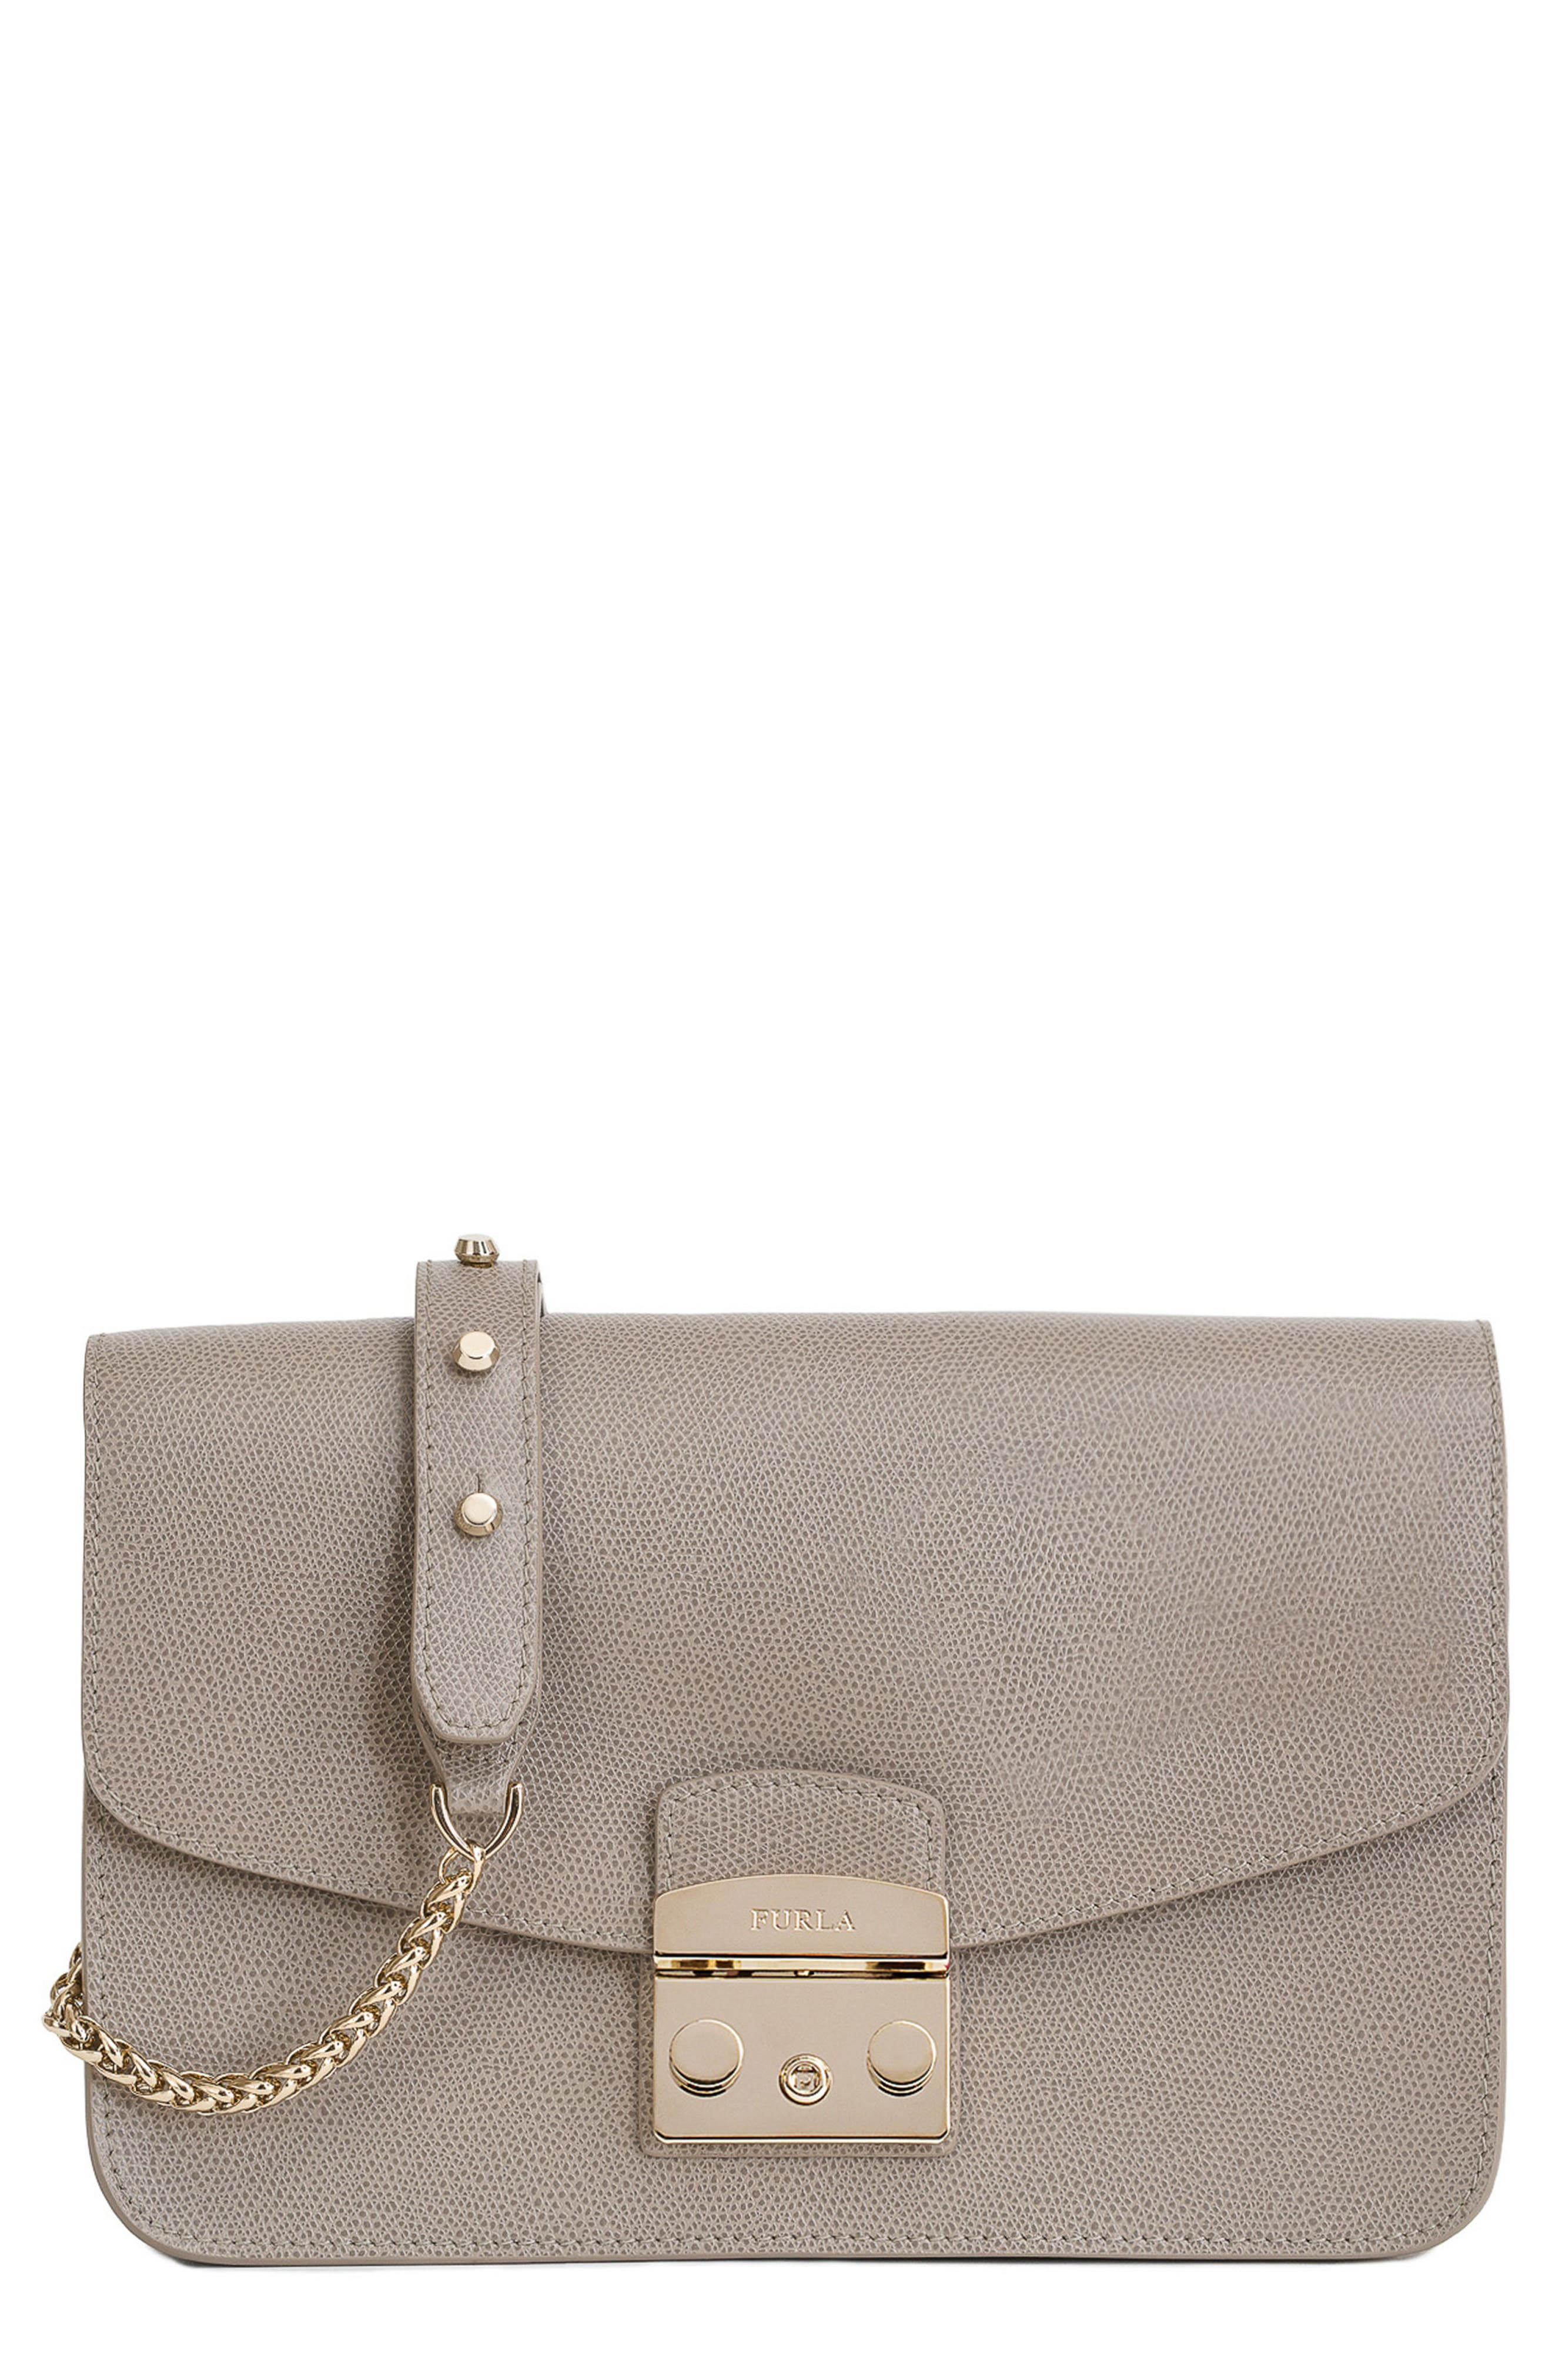 Furla Small Metropolis Leather Crossbody Bag